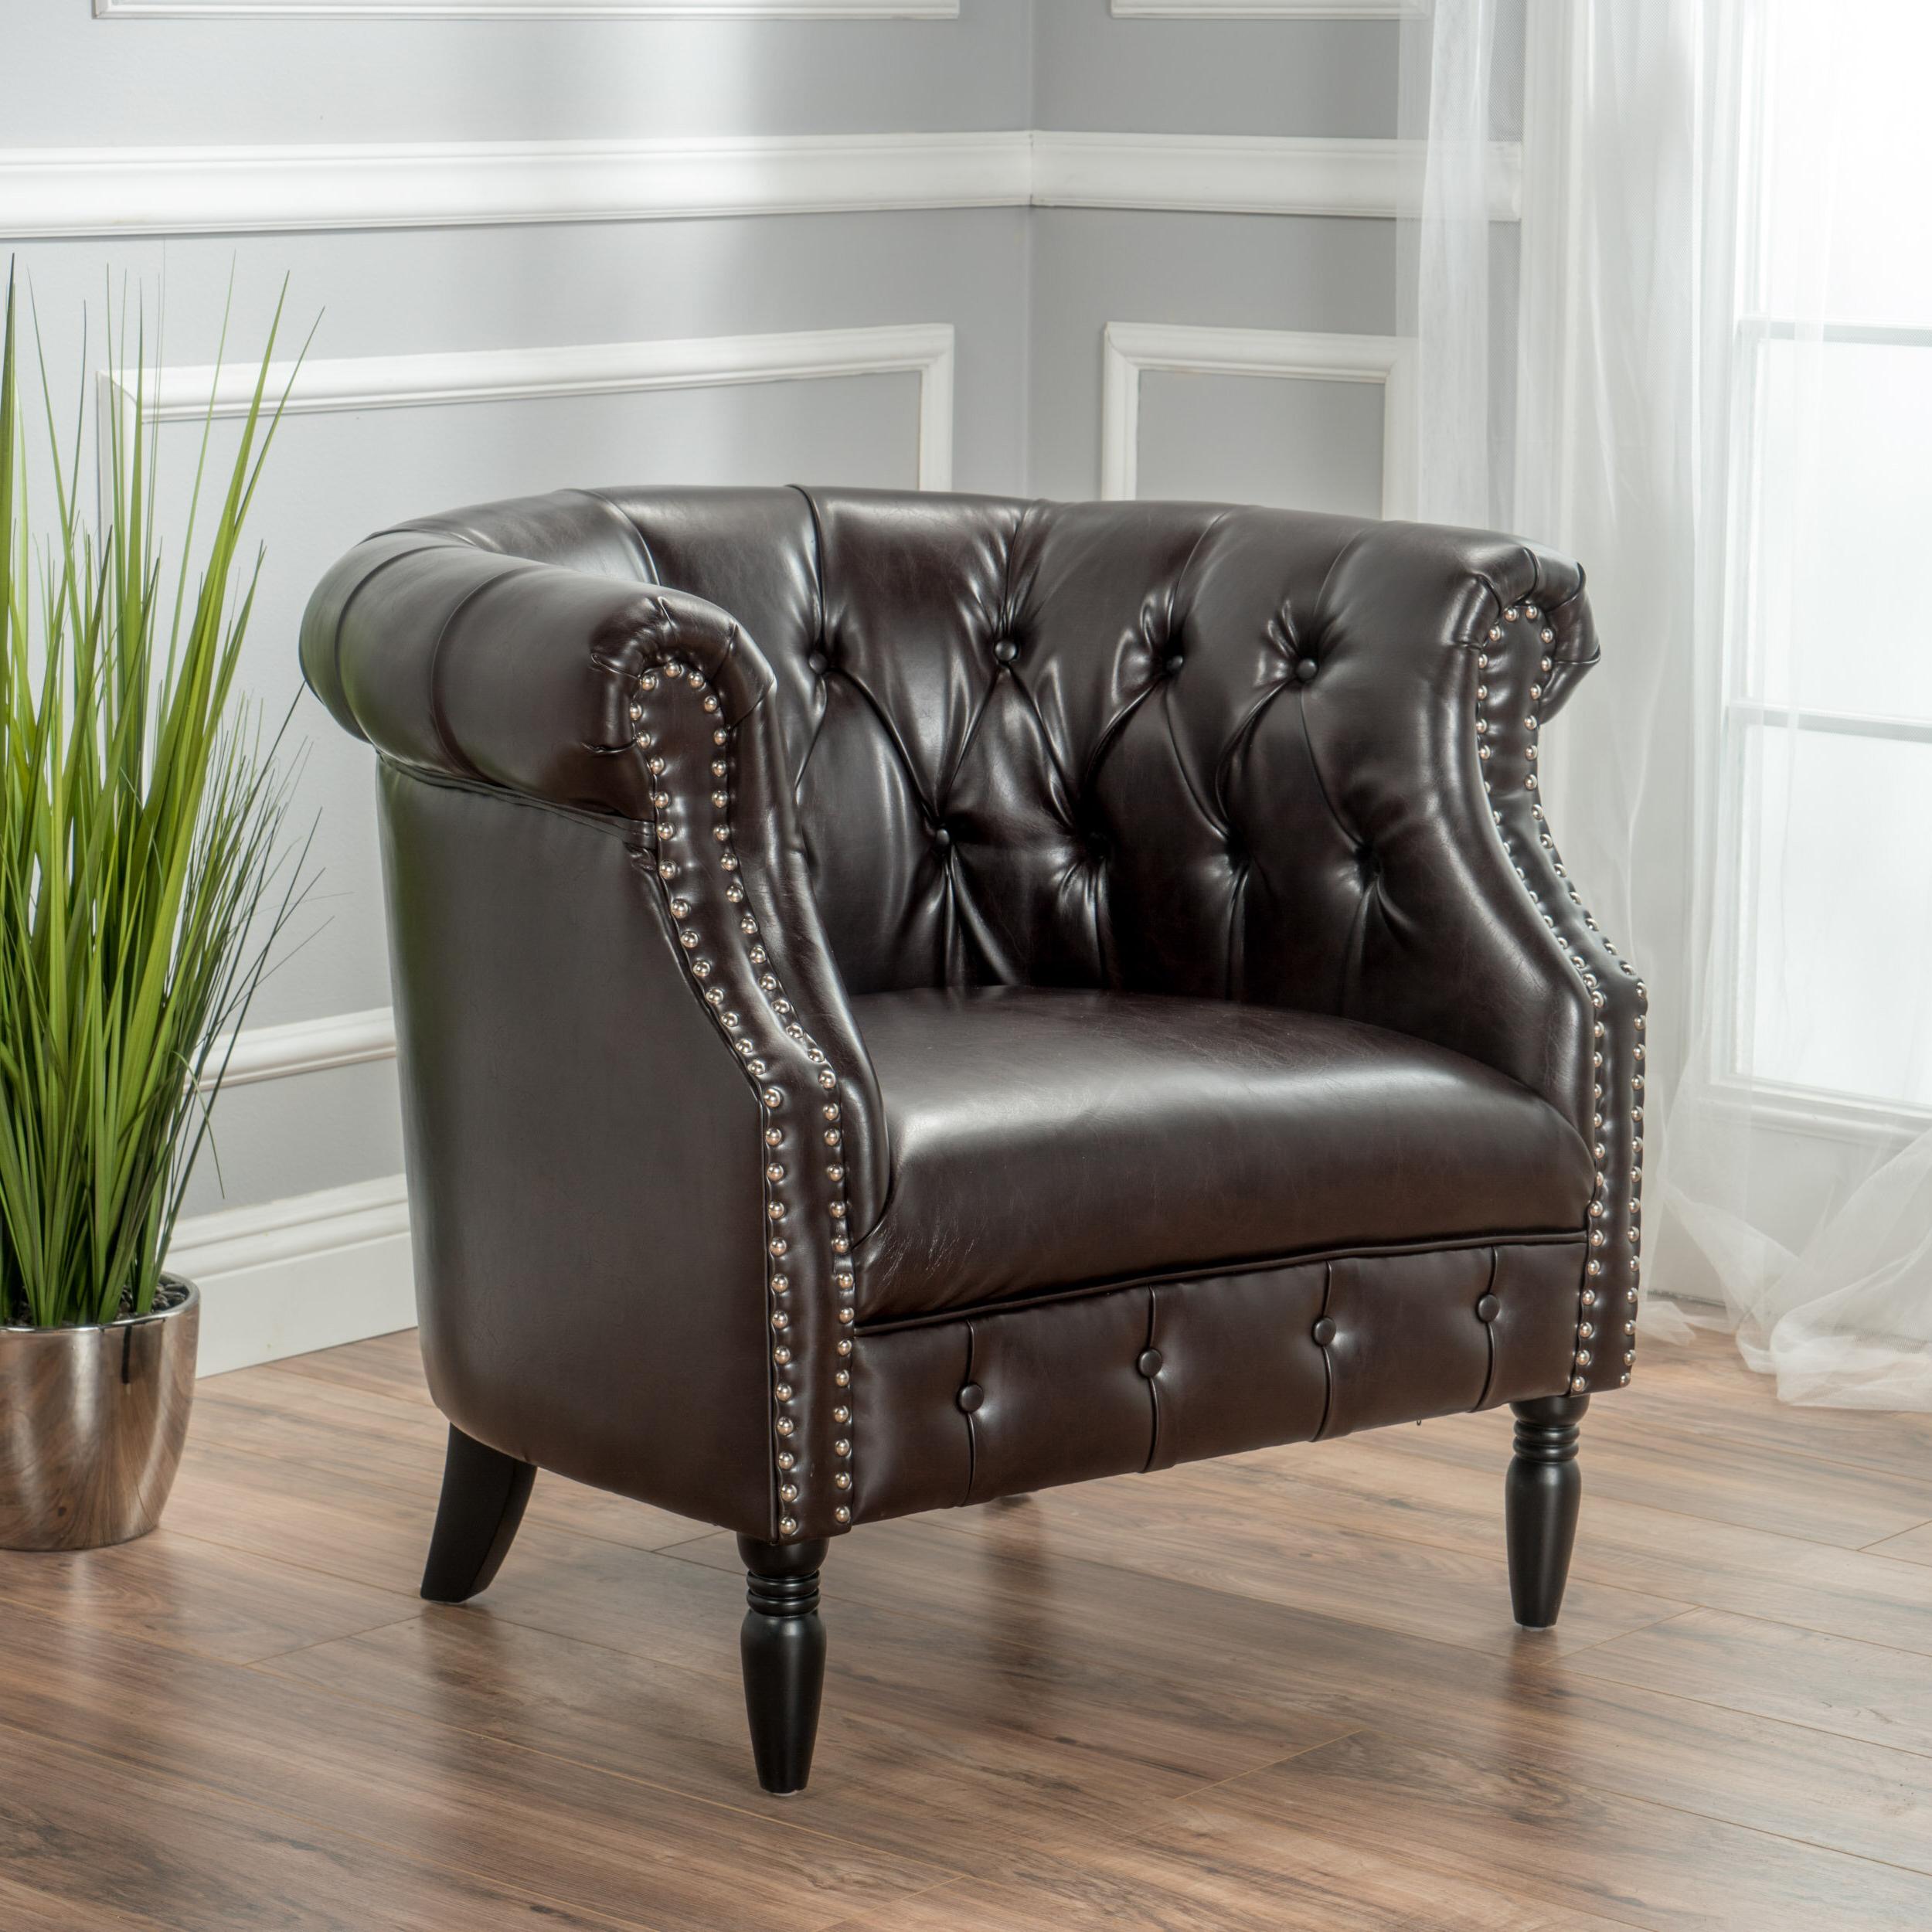 Wayfair Throughout Kjellfrid Chesterfield Chairs (View 7 of 20)